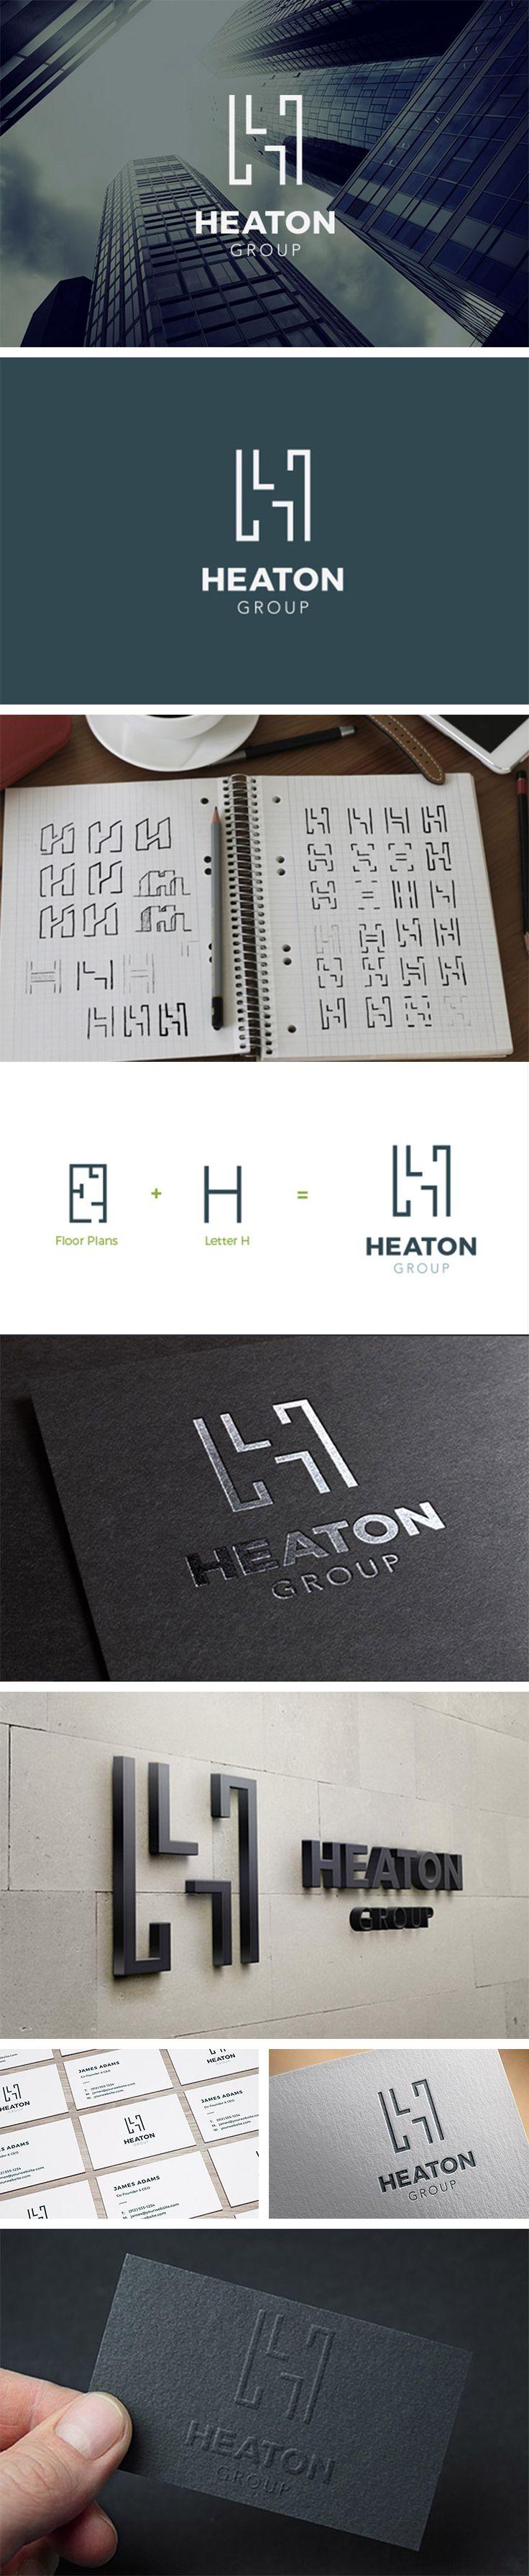 Logo Design Real Estate, Brand Identity Property